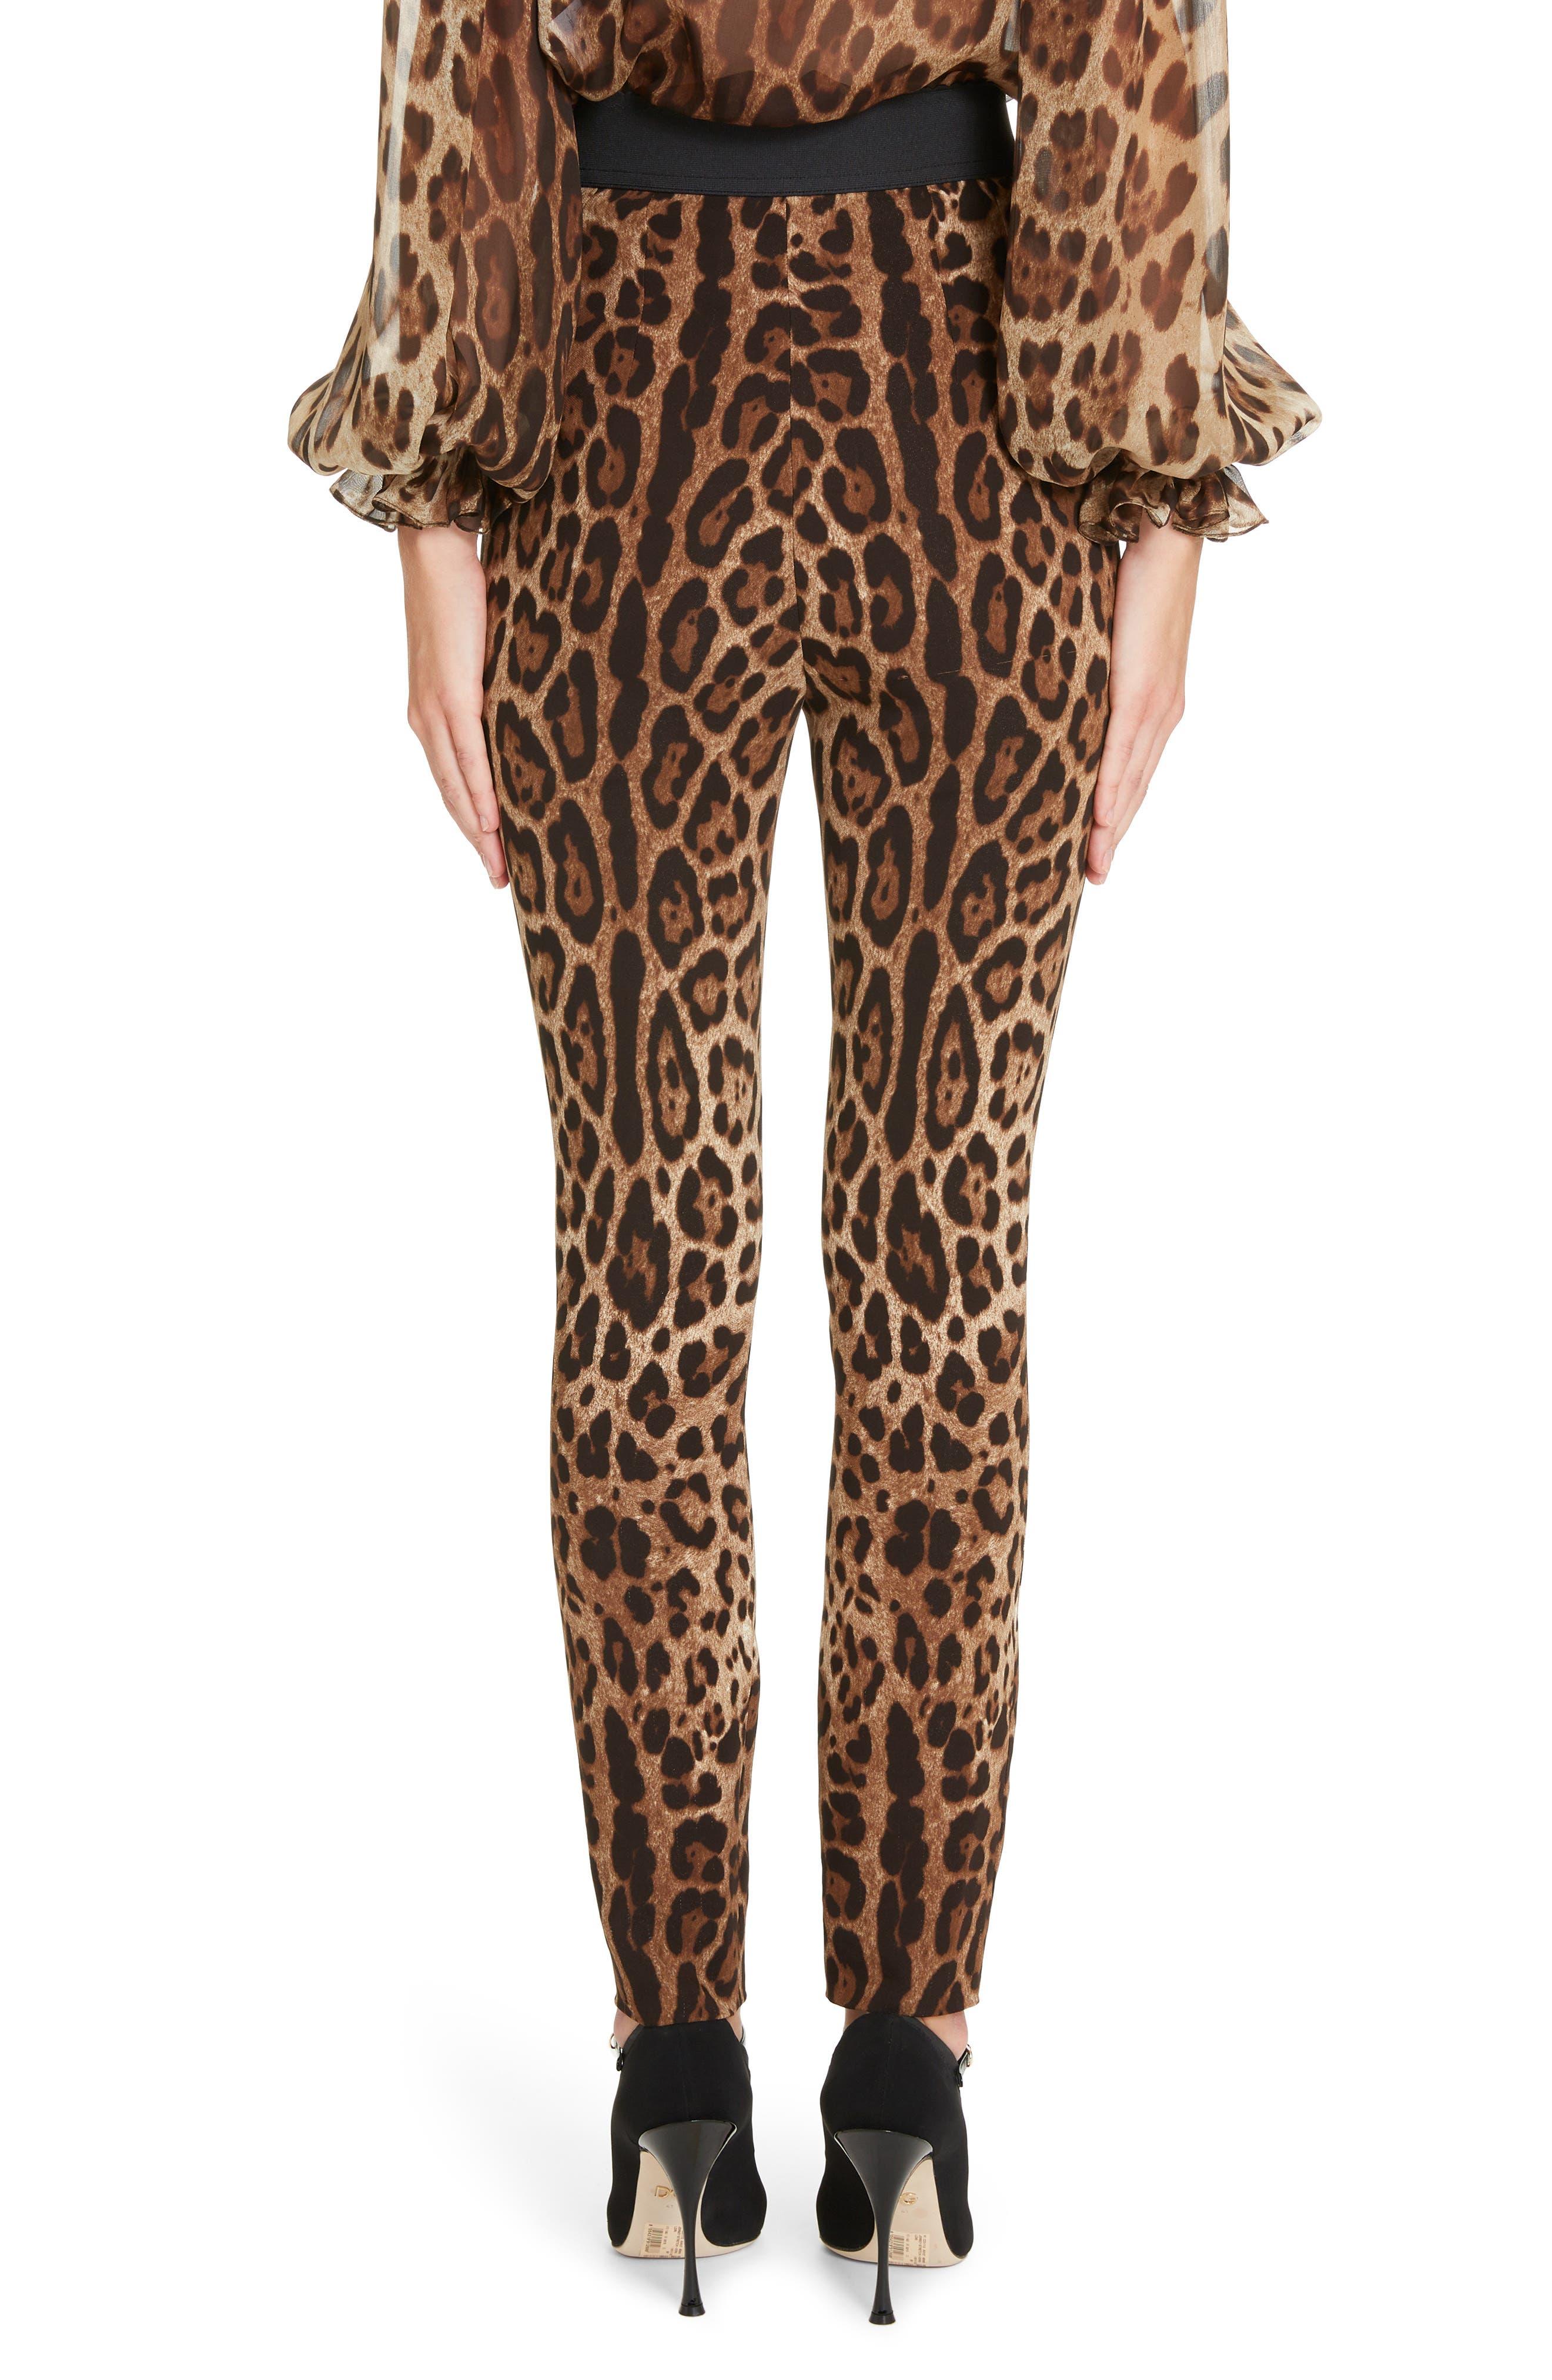 DOLCE&GABBANA, Leopard Print Cady Leggings, Alternate thumbnail 2, color, LEO